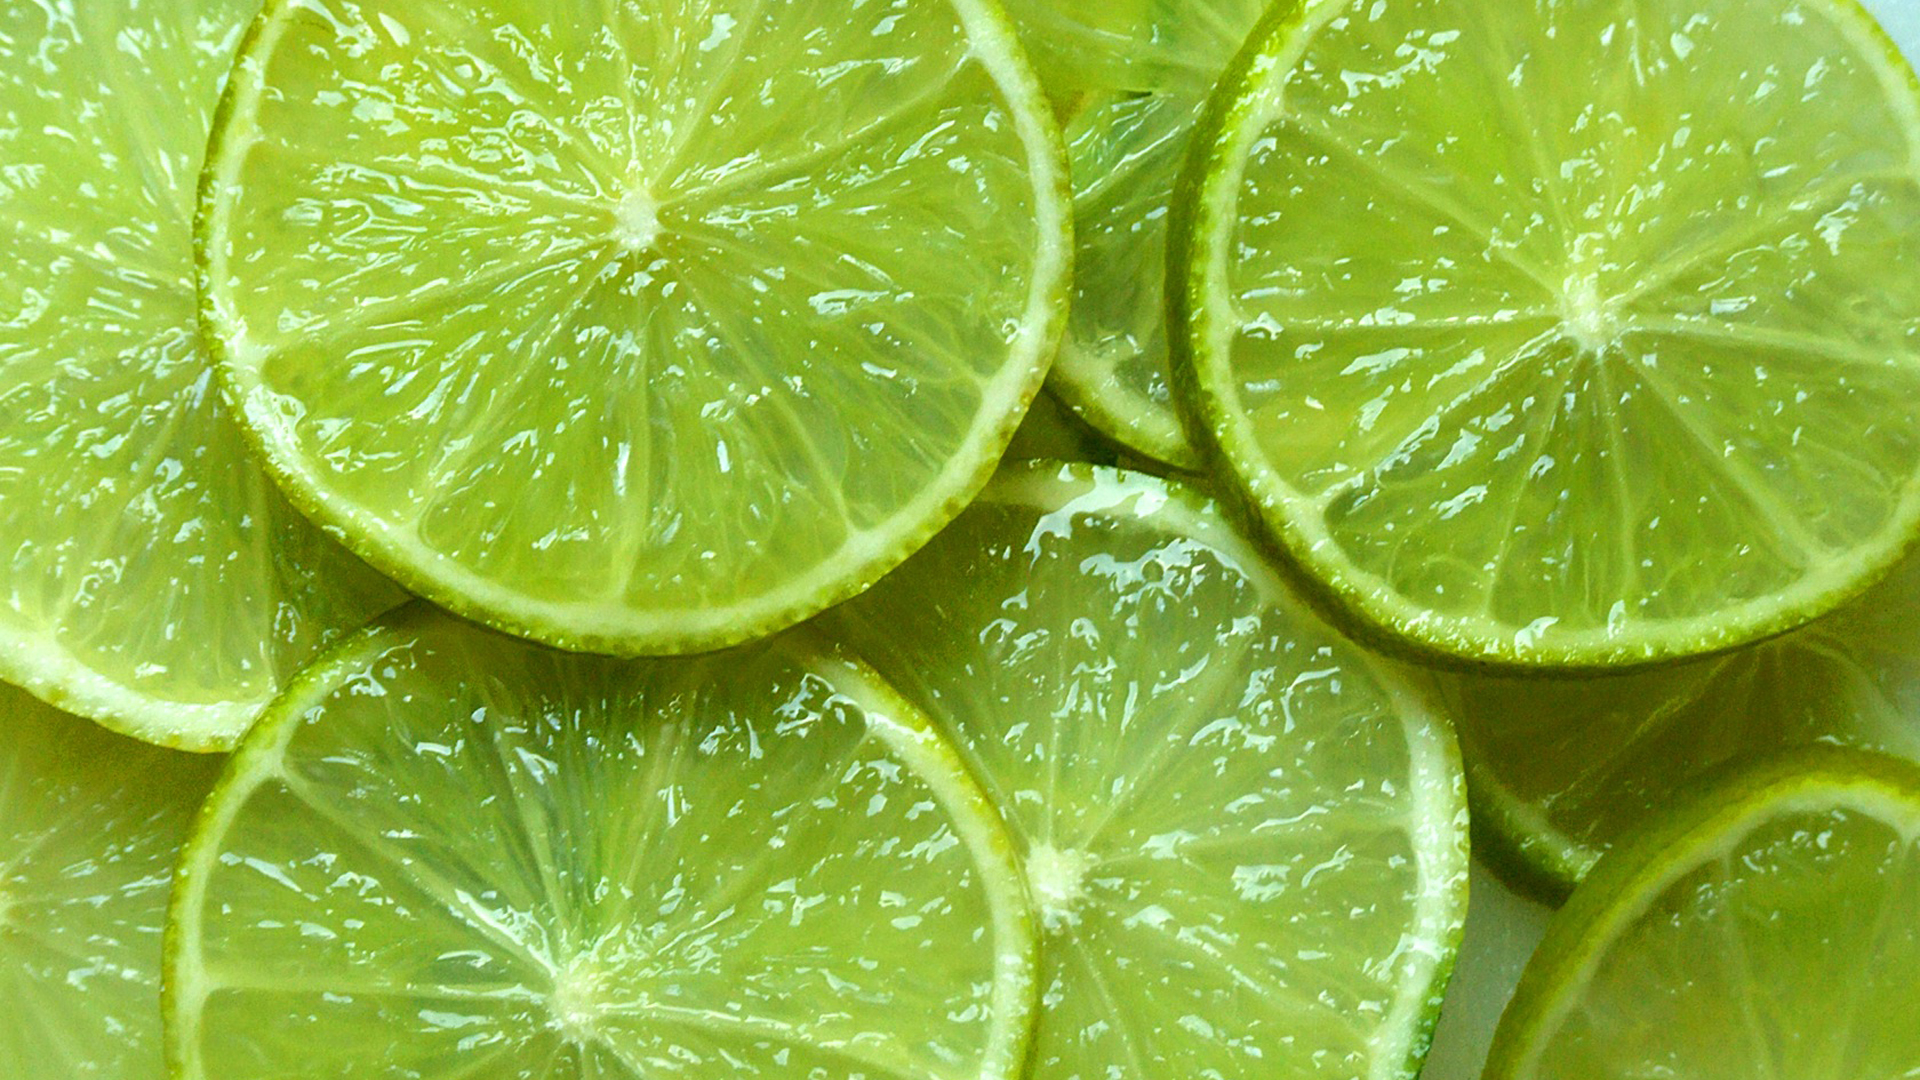 fruits food limes fruit lime